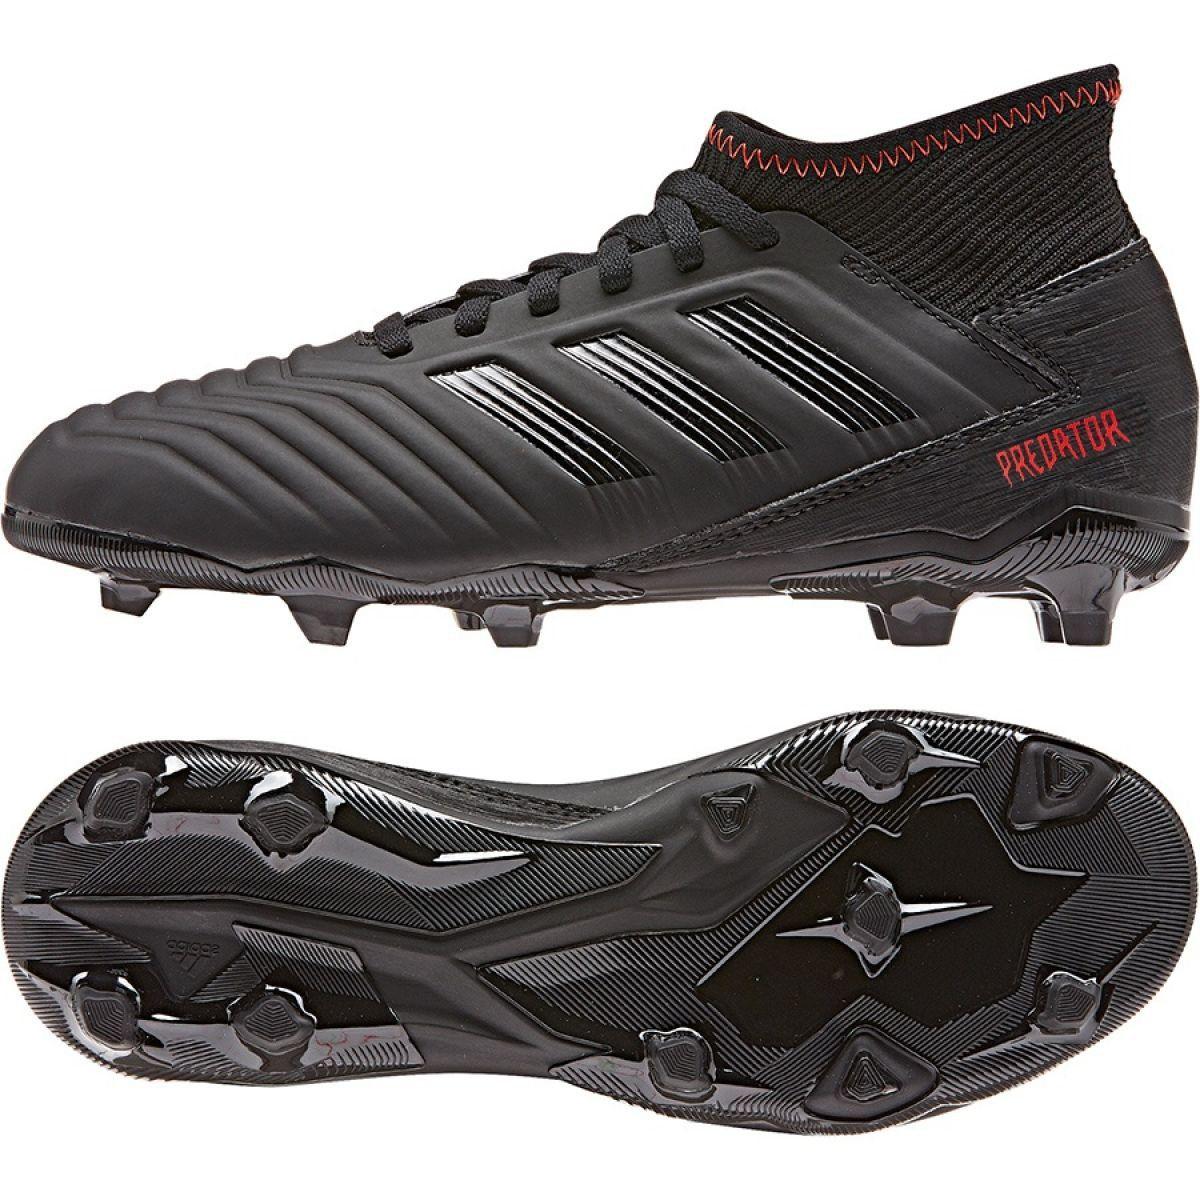 Buty Pilkarskie Adidas Predator 19 3 Jr D98003 Czarne Wielokolorowe Black Football Boots Football Boots Adidas Predator